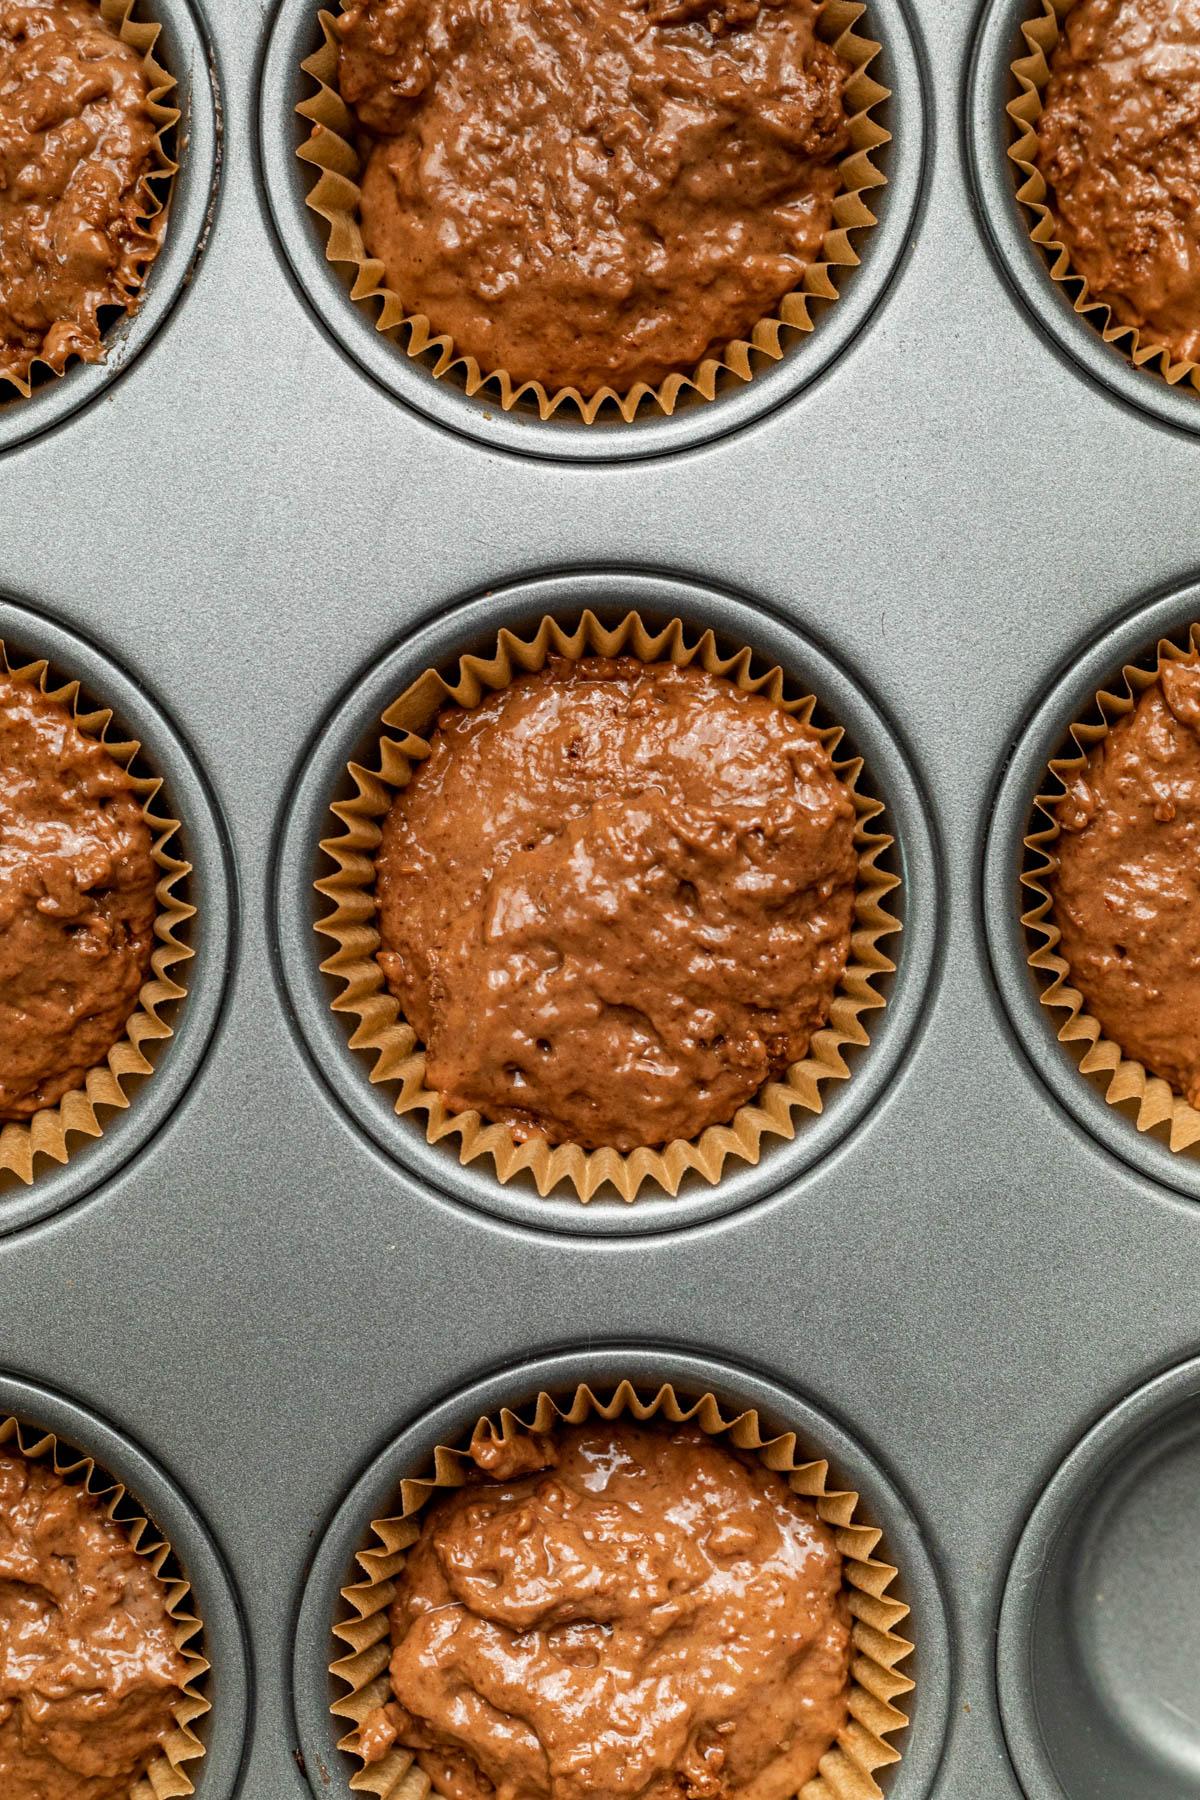 Cupcakes before baking.